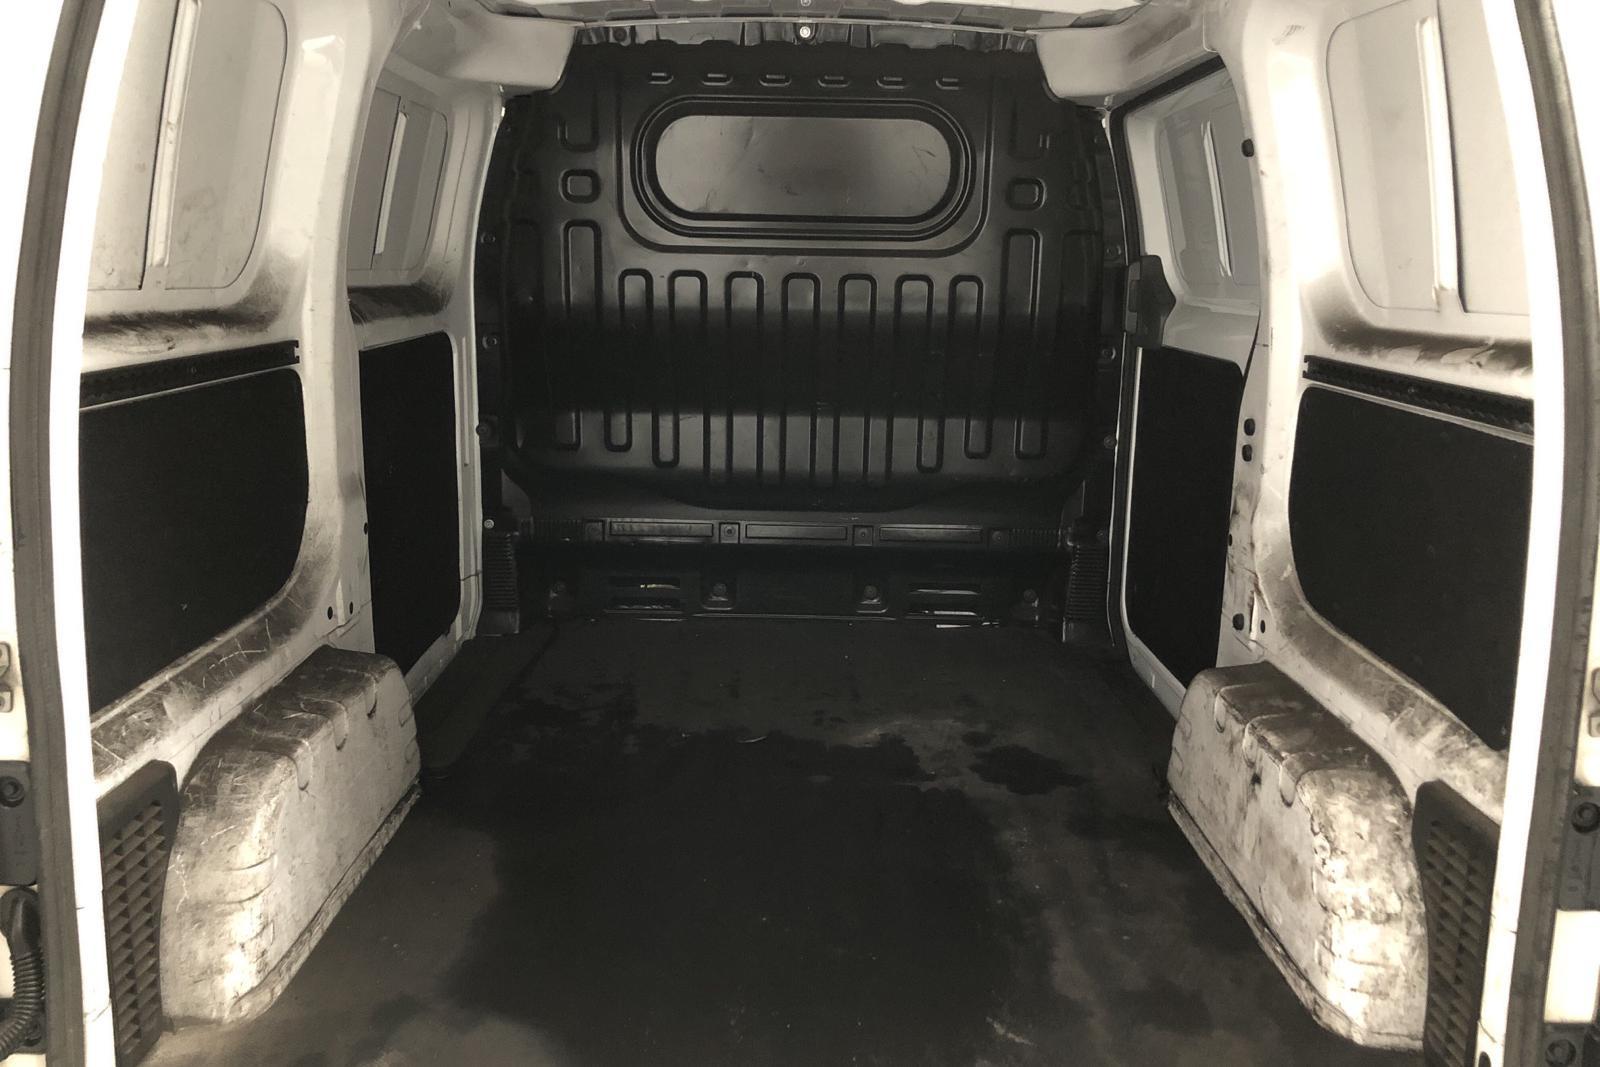 Nissan NV200 1.5 dCi Skåp (90hk) - 68 960 km - Manual - white - 2016